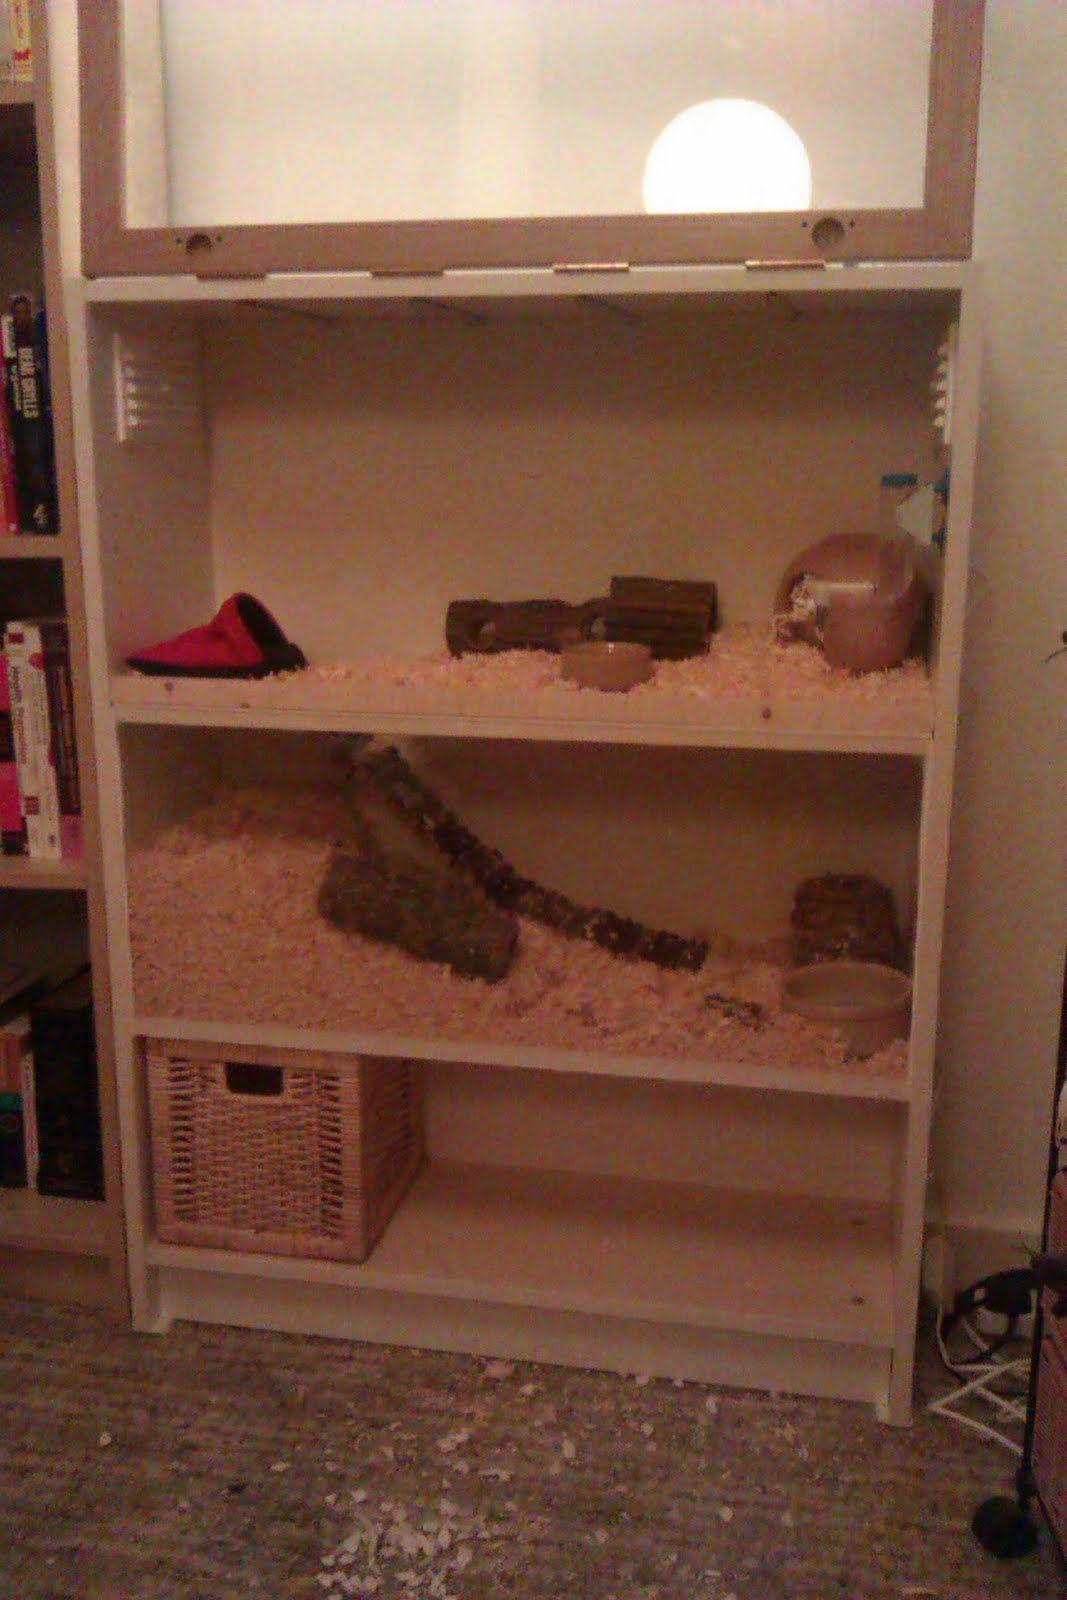 make your own two storey hamster apartment hamster stuff pinterest hamster cages guinea. Black Bedroom Furniture Sets. Home Design Ideas